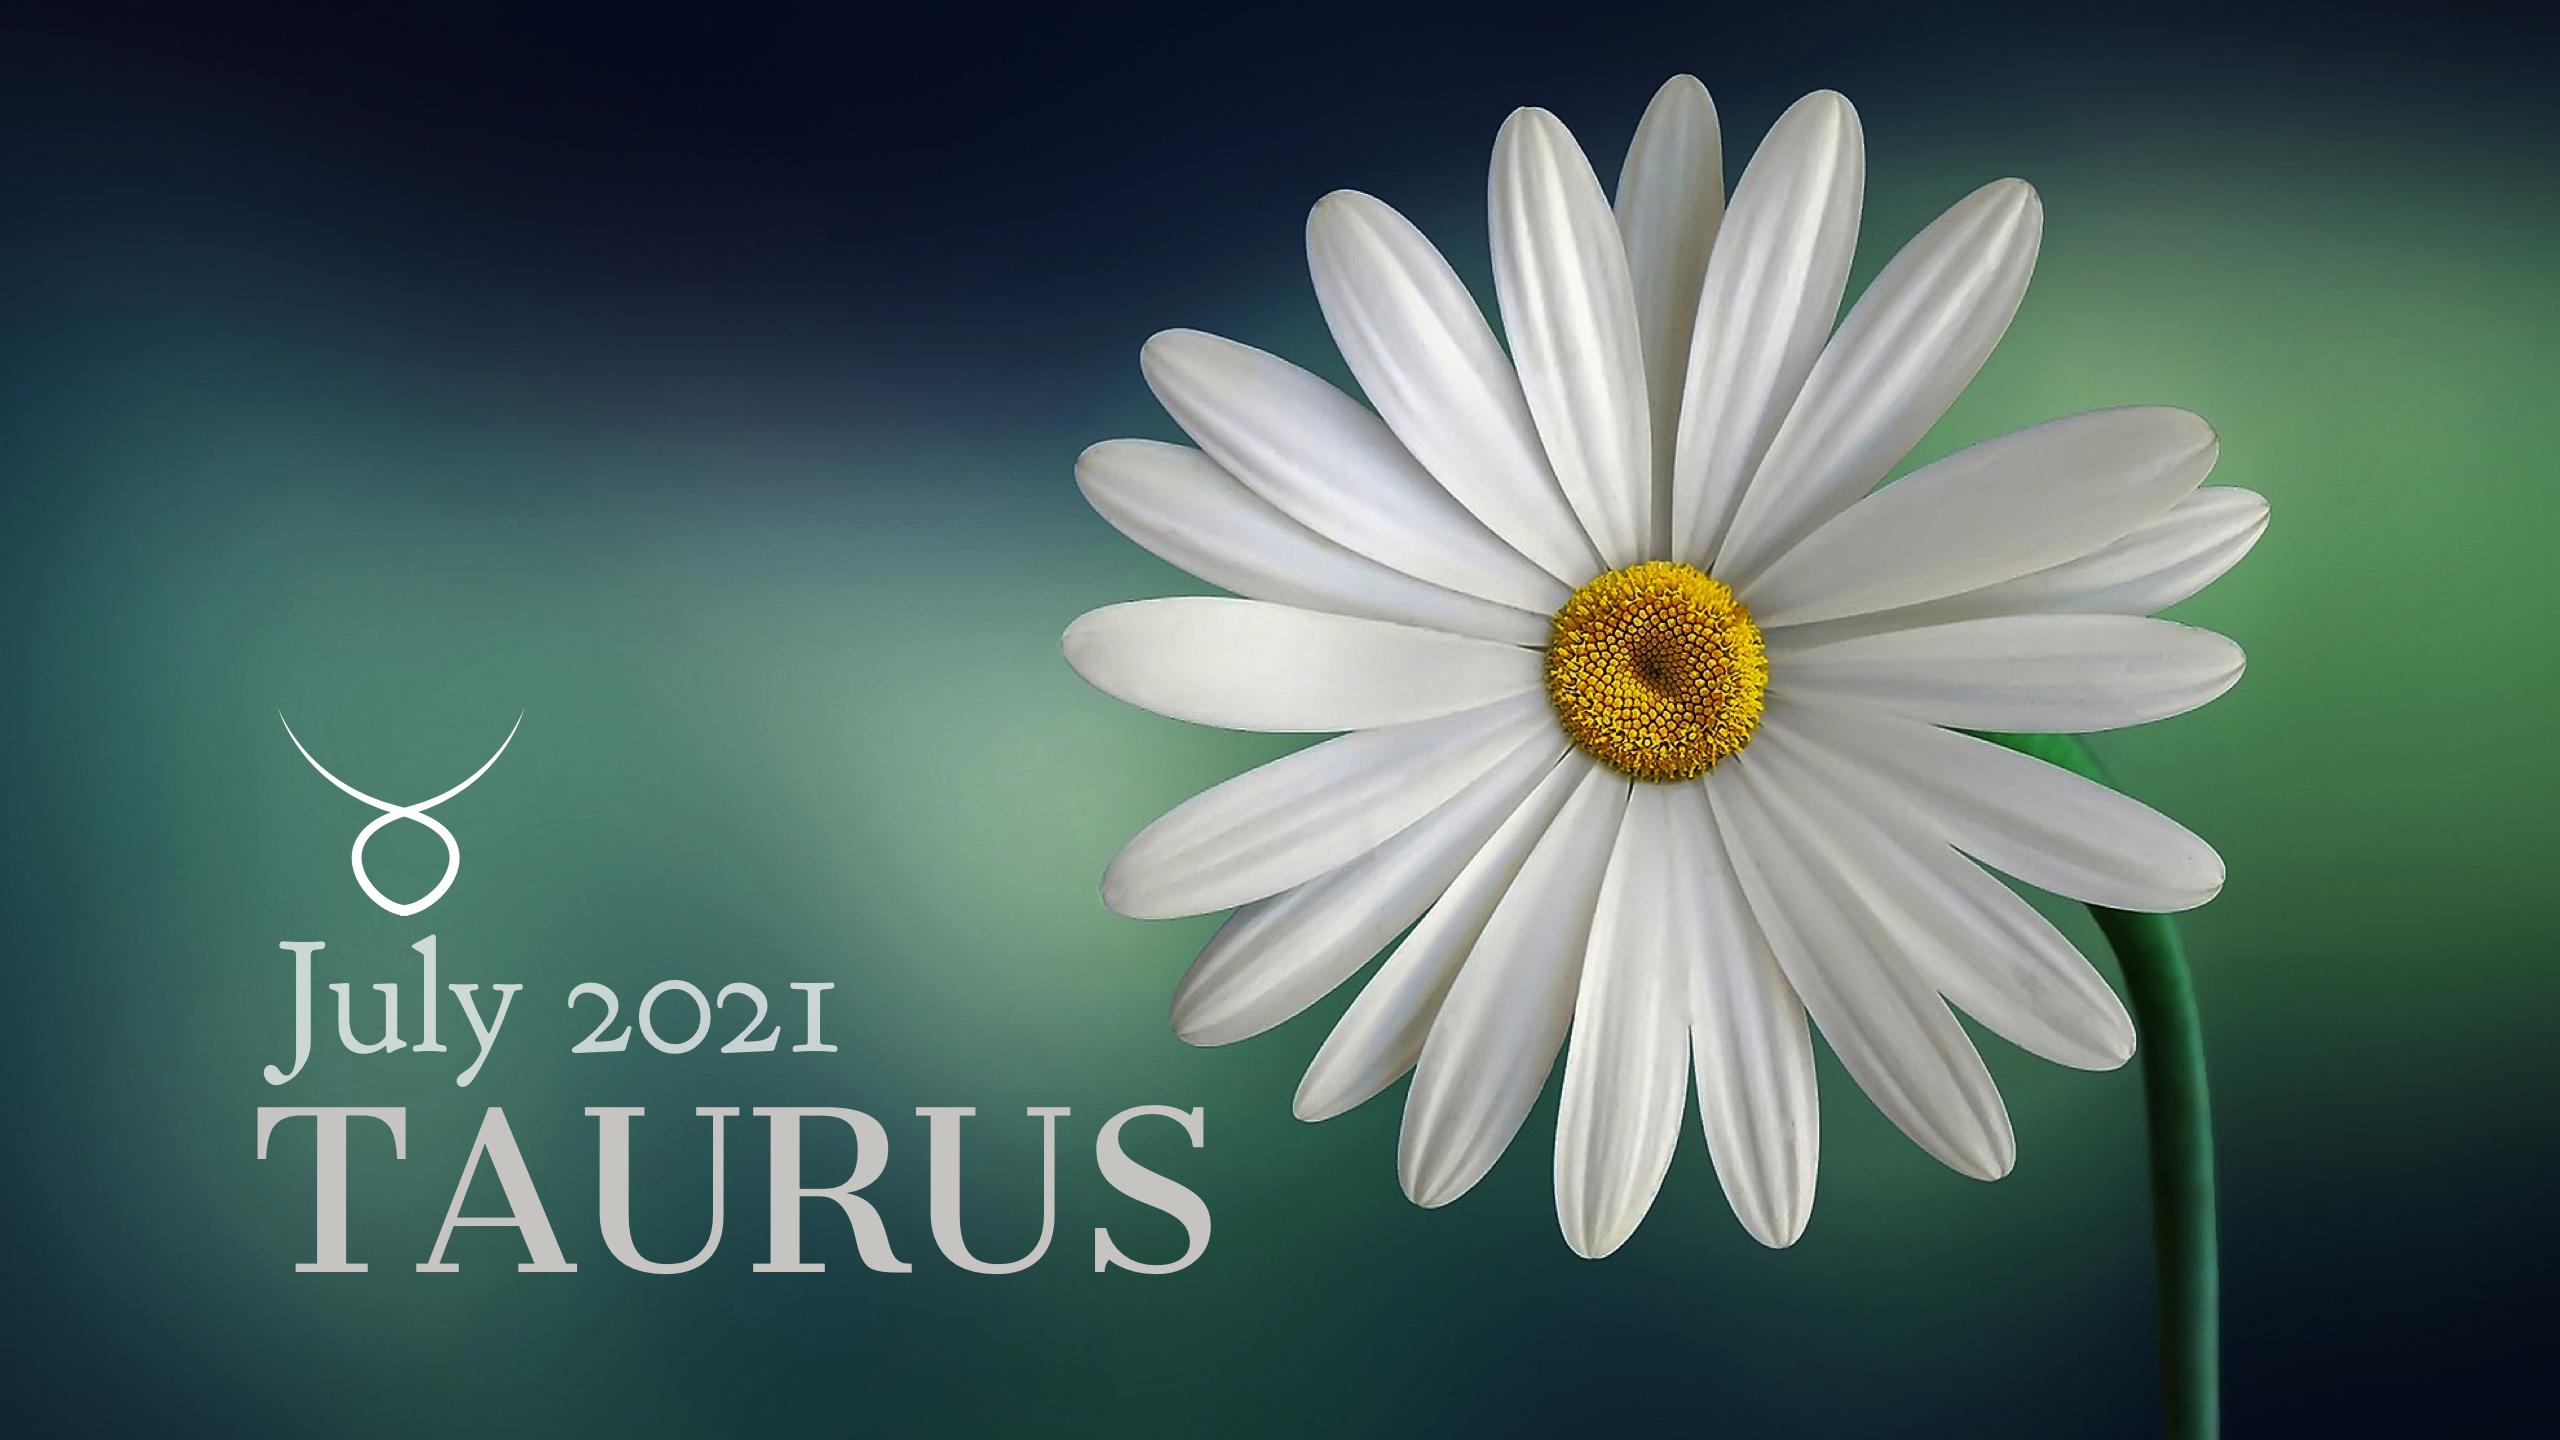 2021 07:Banner:02 Taurus